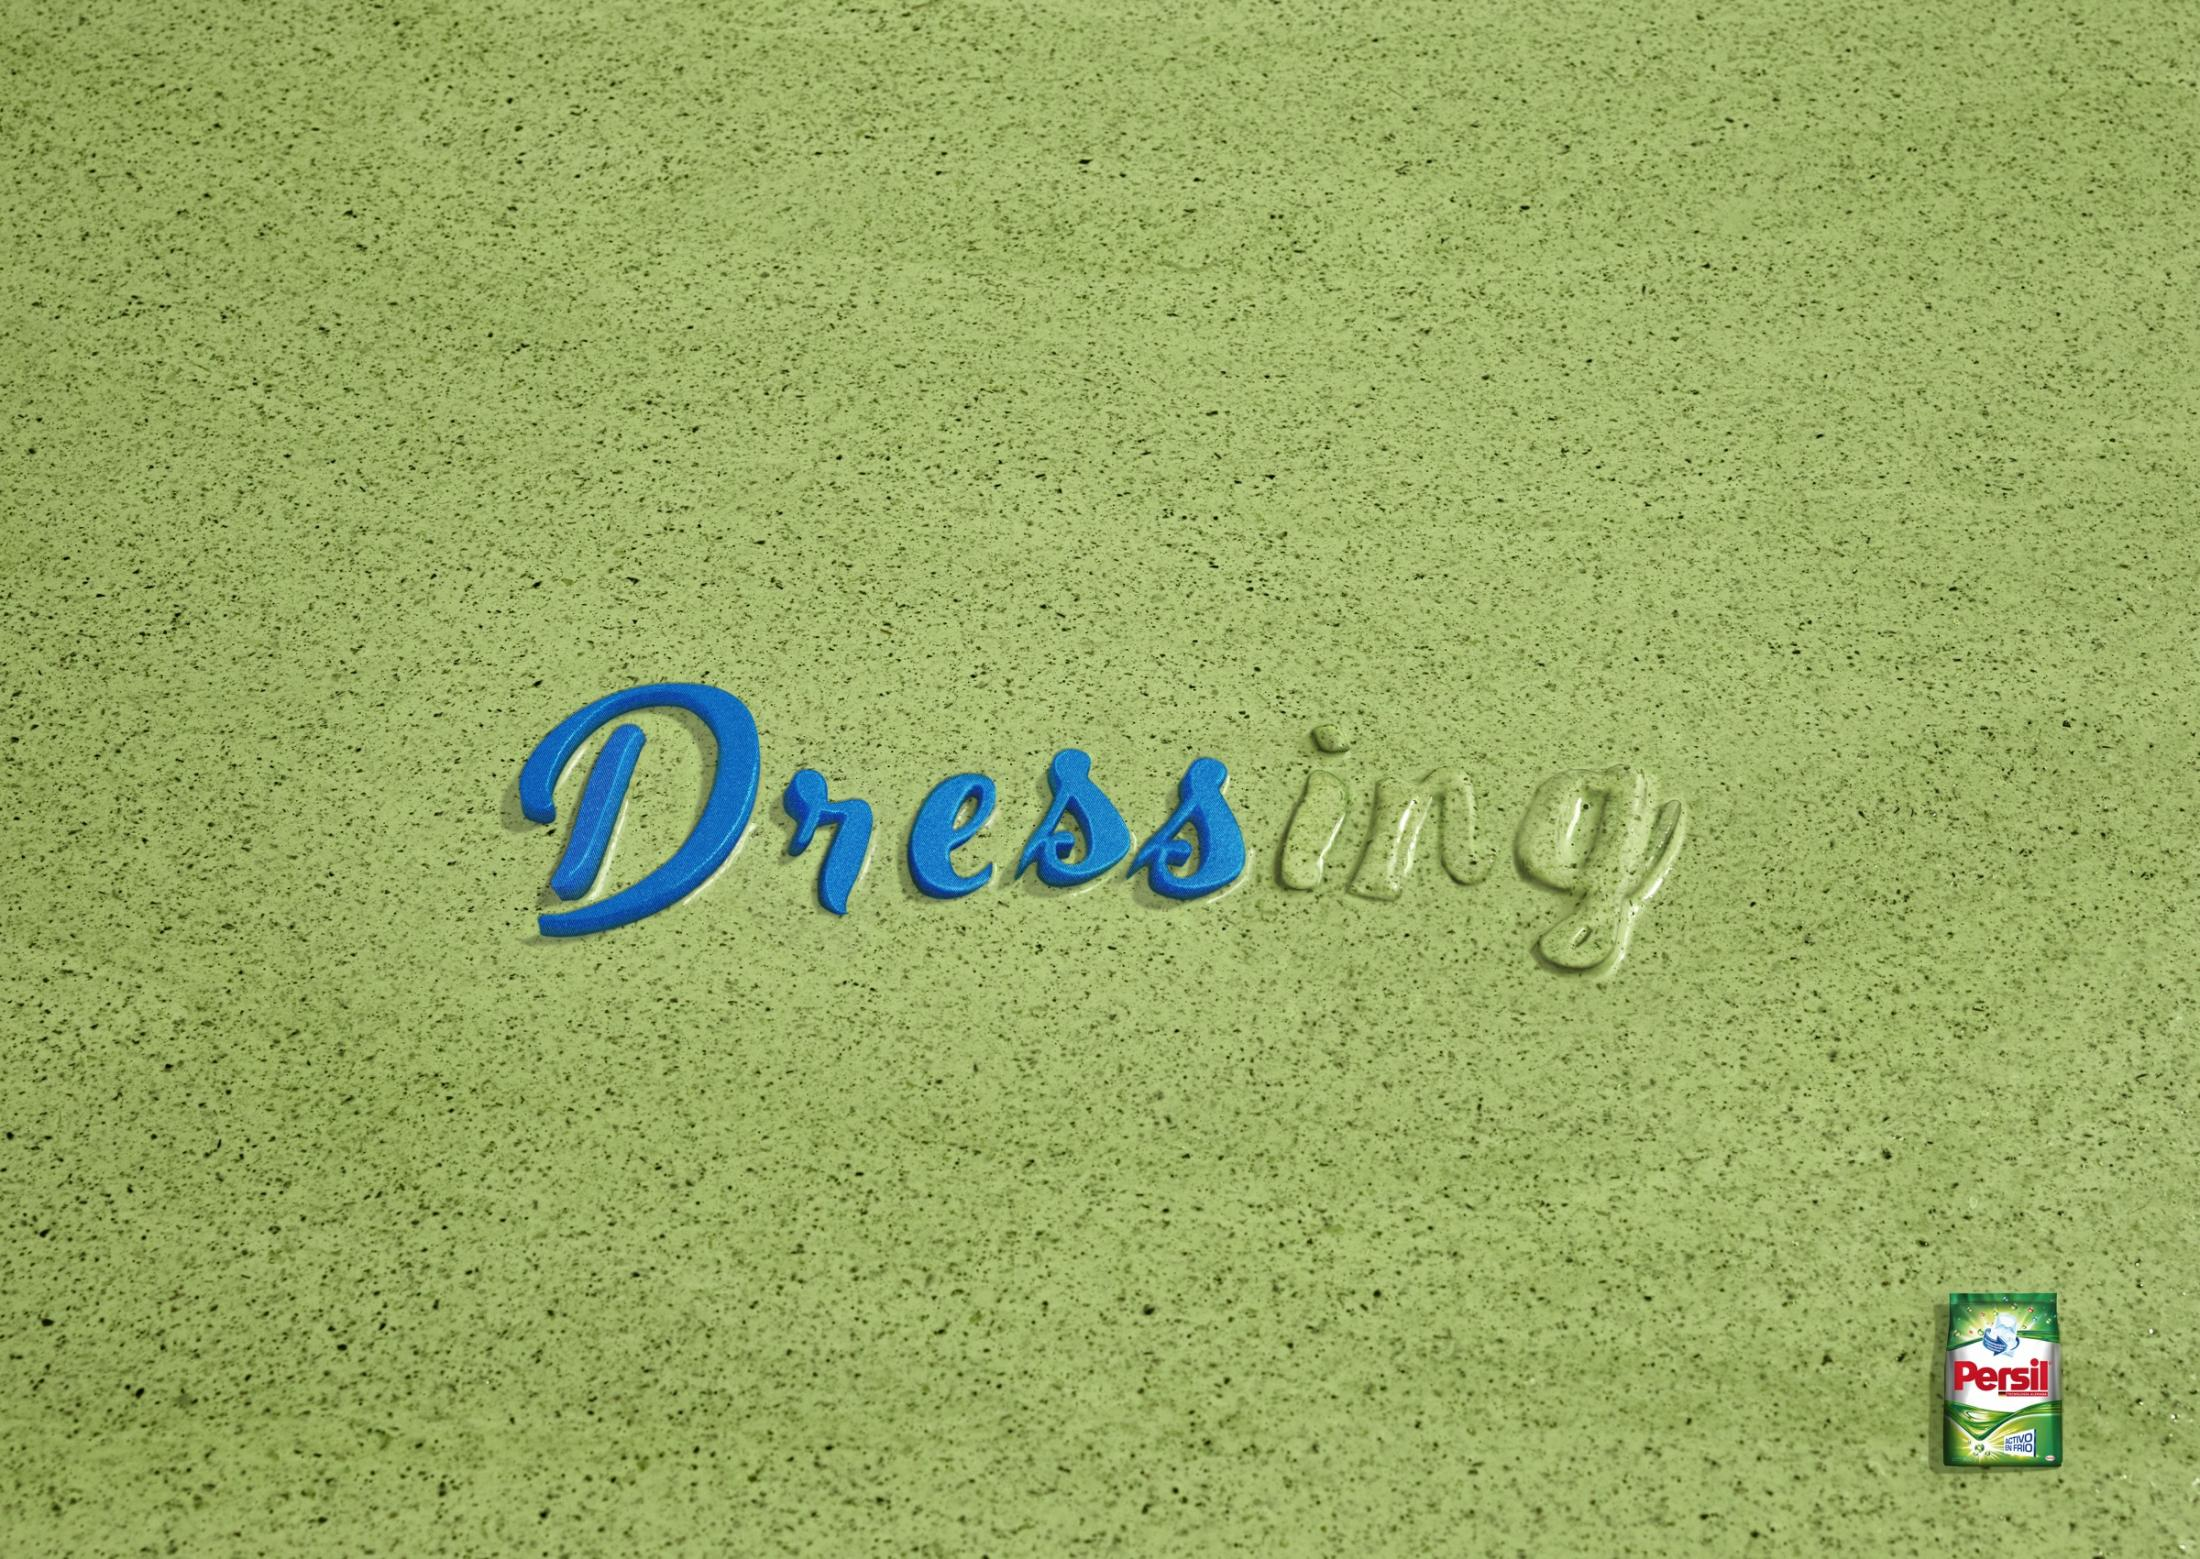 master_persil_cannes_dressing_aotw.jpg